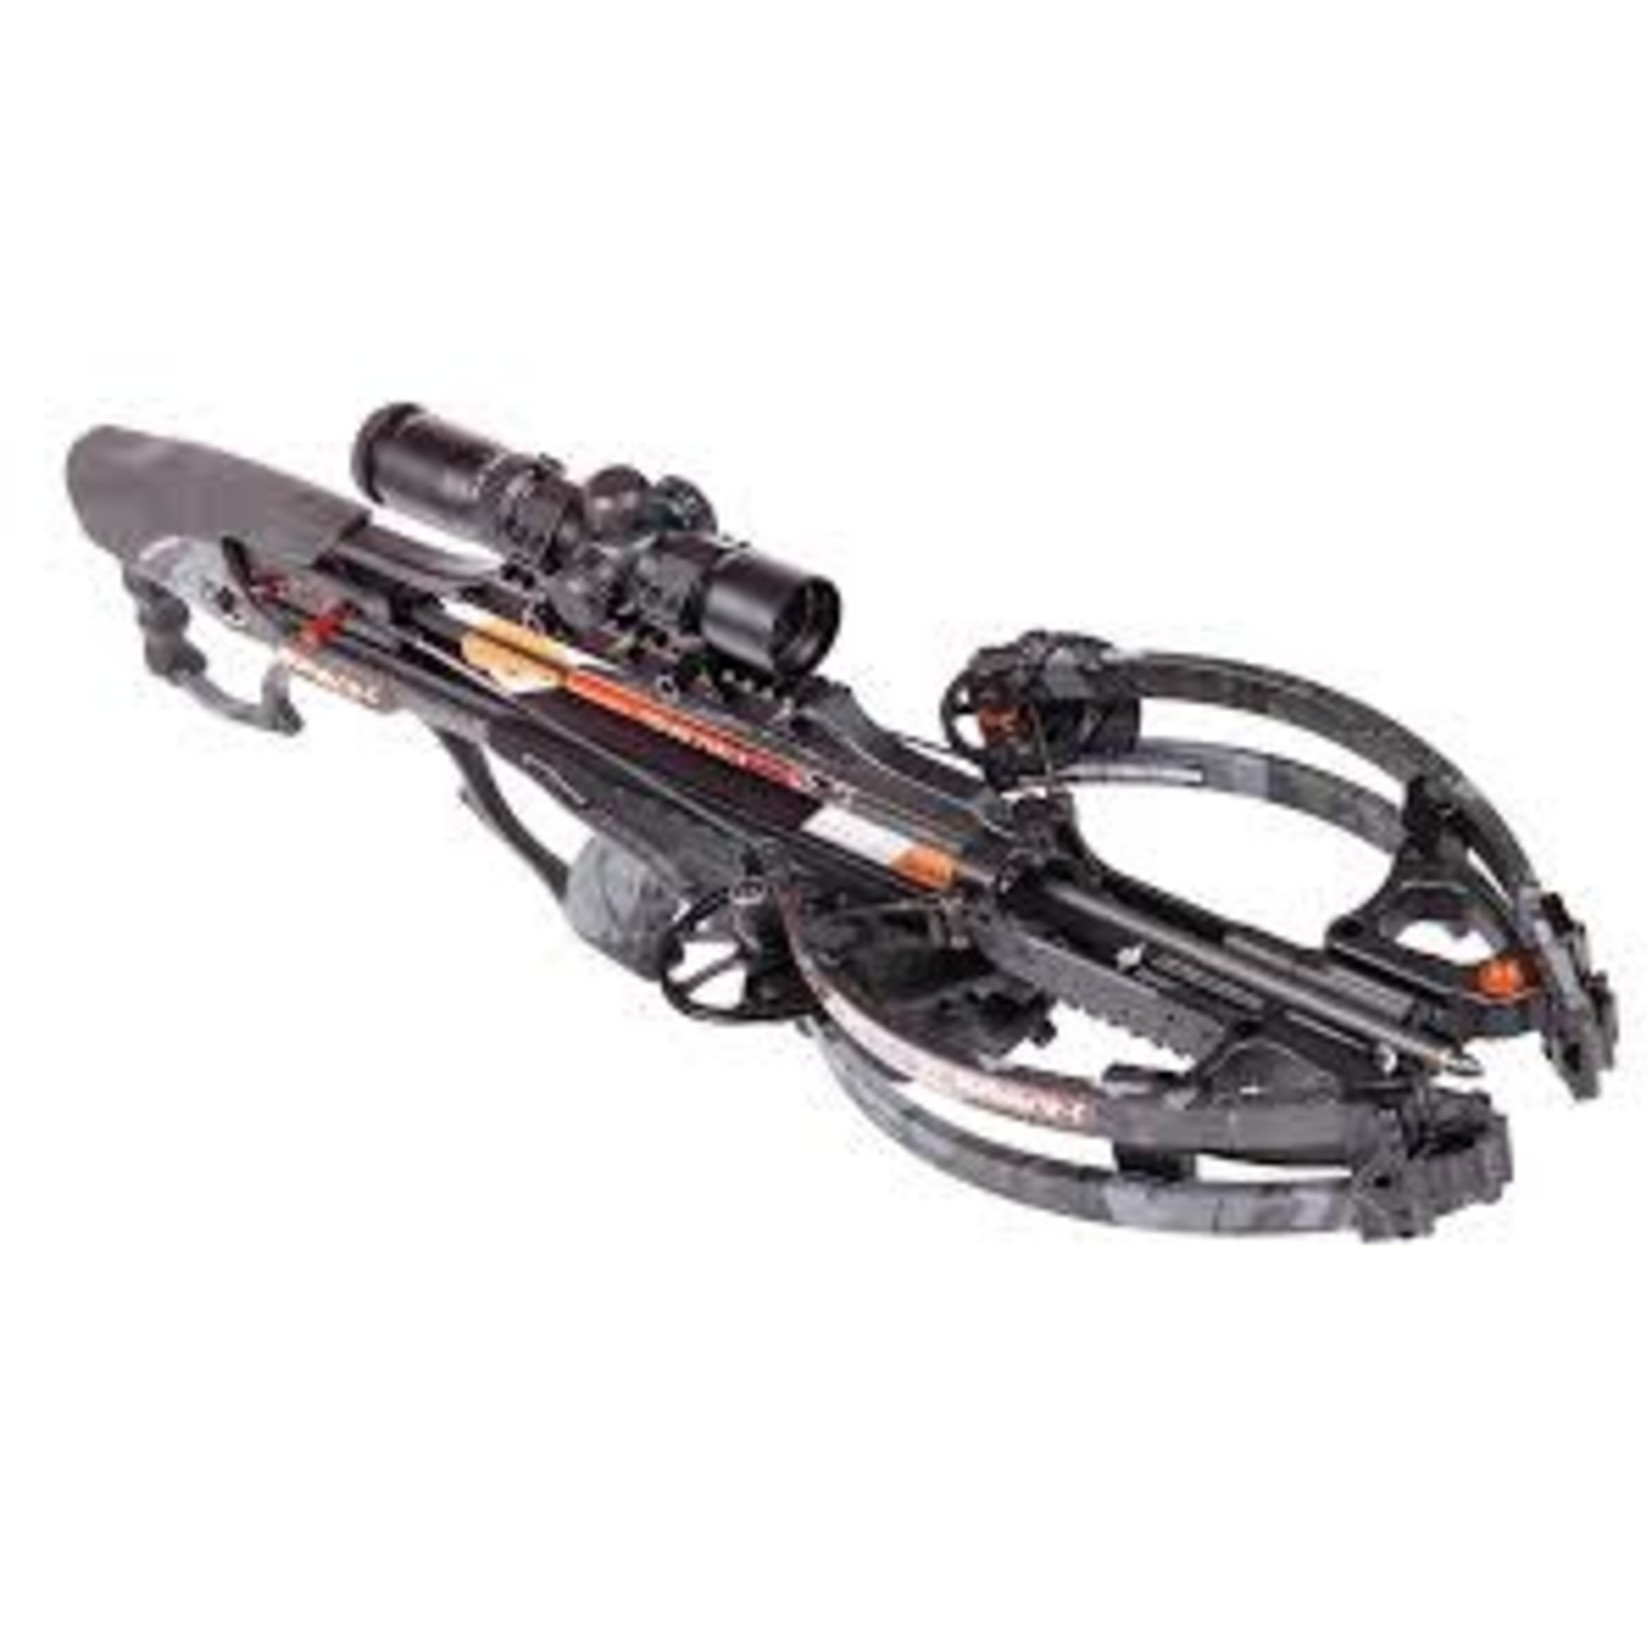 Ravin Ravin R29X Crossbow Predator Camo